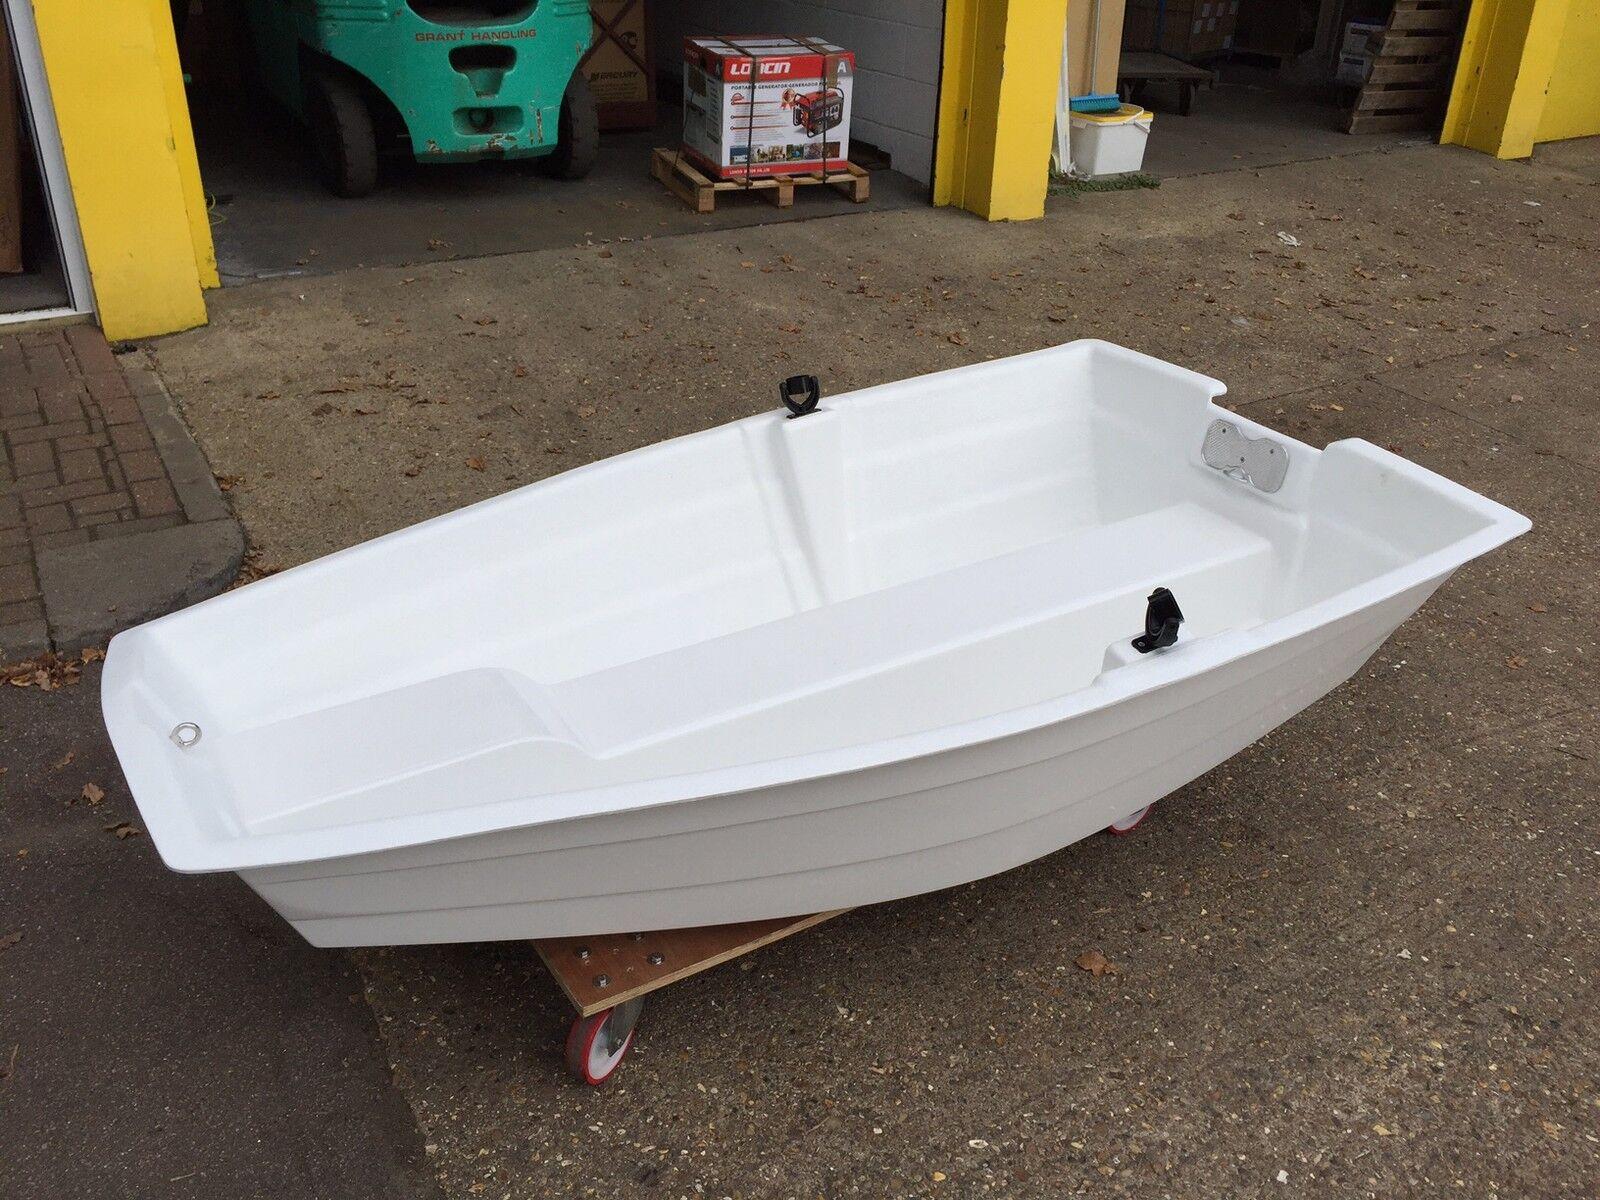 TO CLEAR Fibreglass Pram Dinghy Rowing Boat 2 m 6' 8  Row Motor Tender Pond